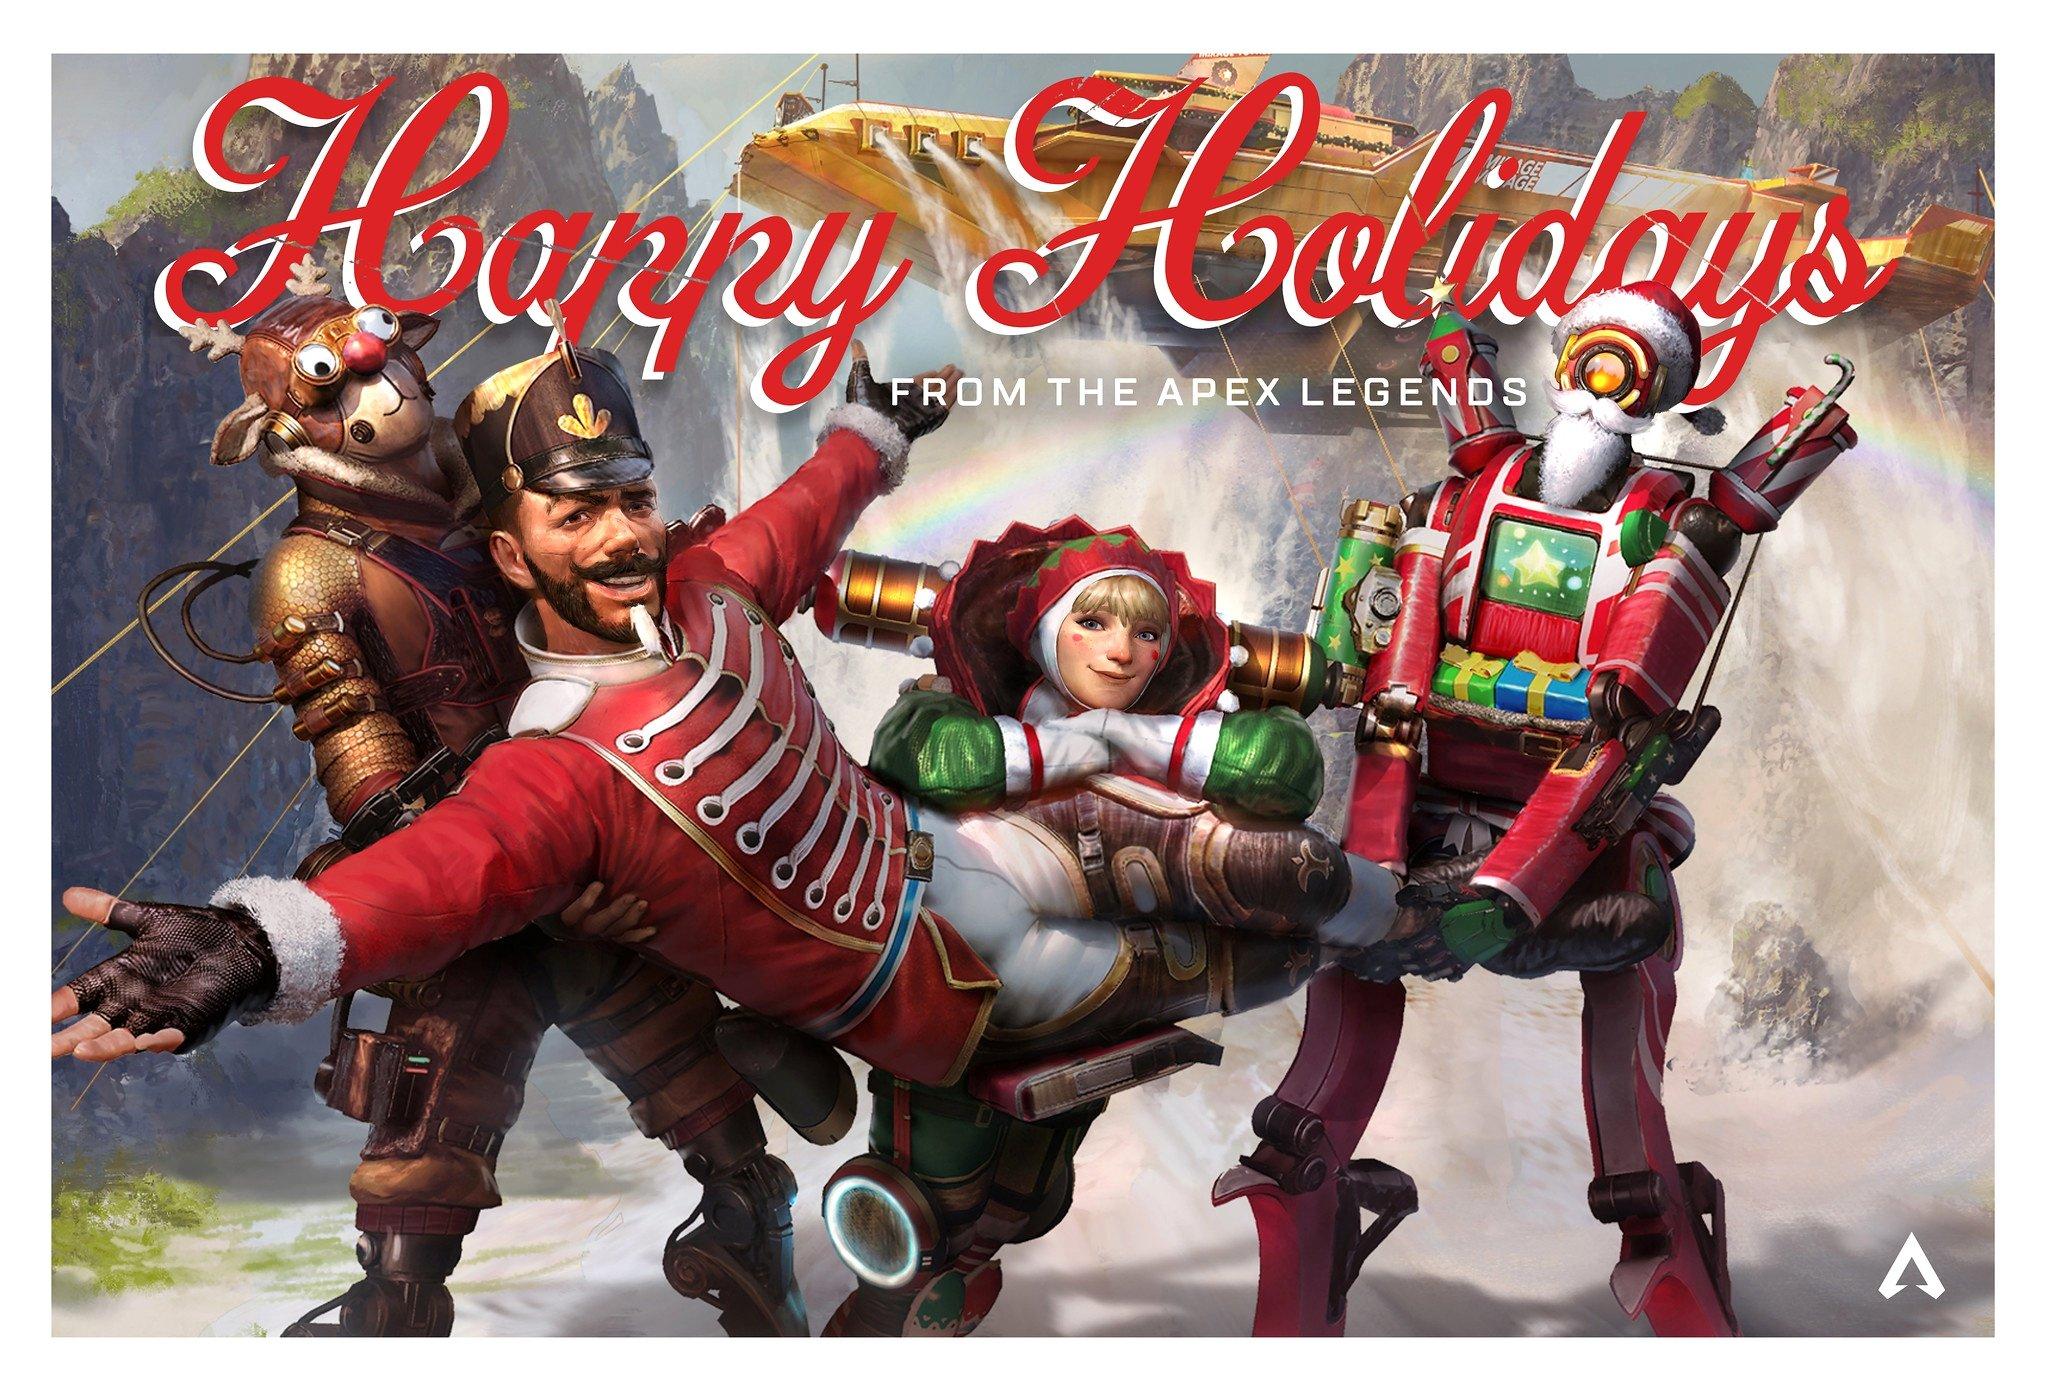 Respawn Happy Holidays Wallpaper